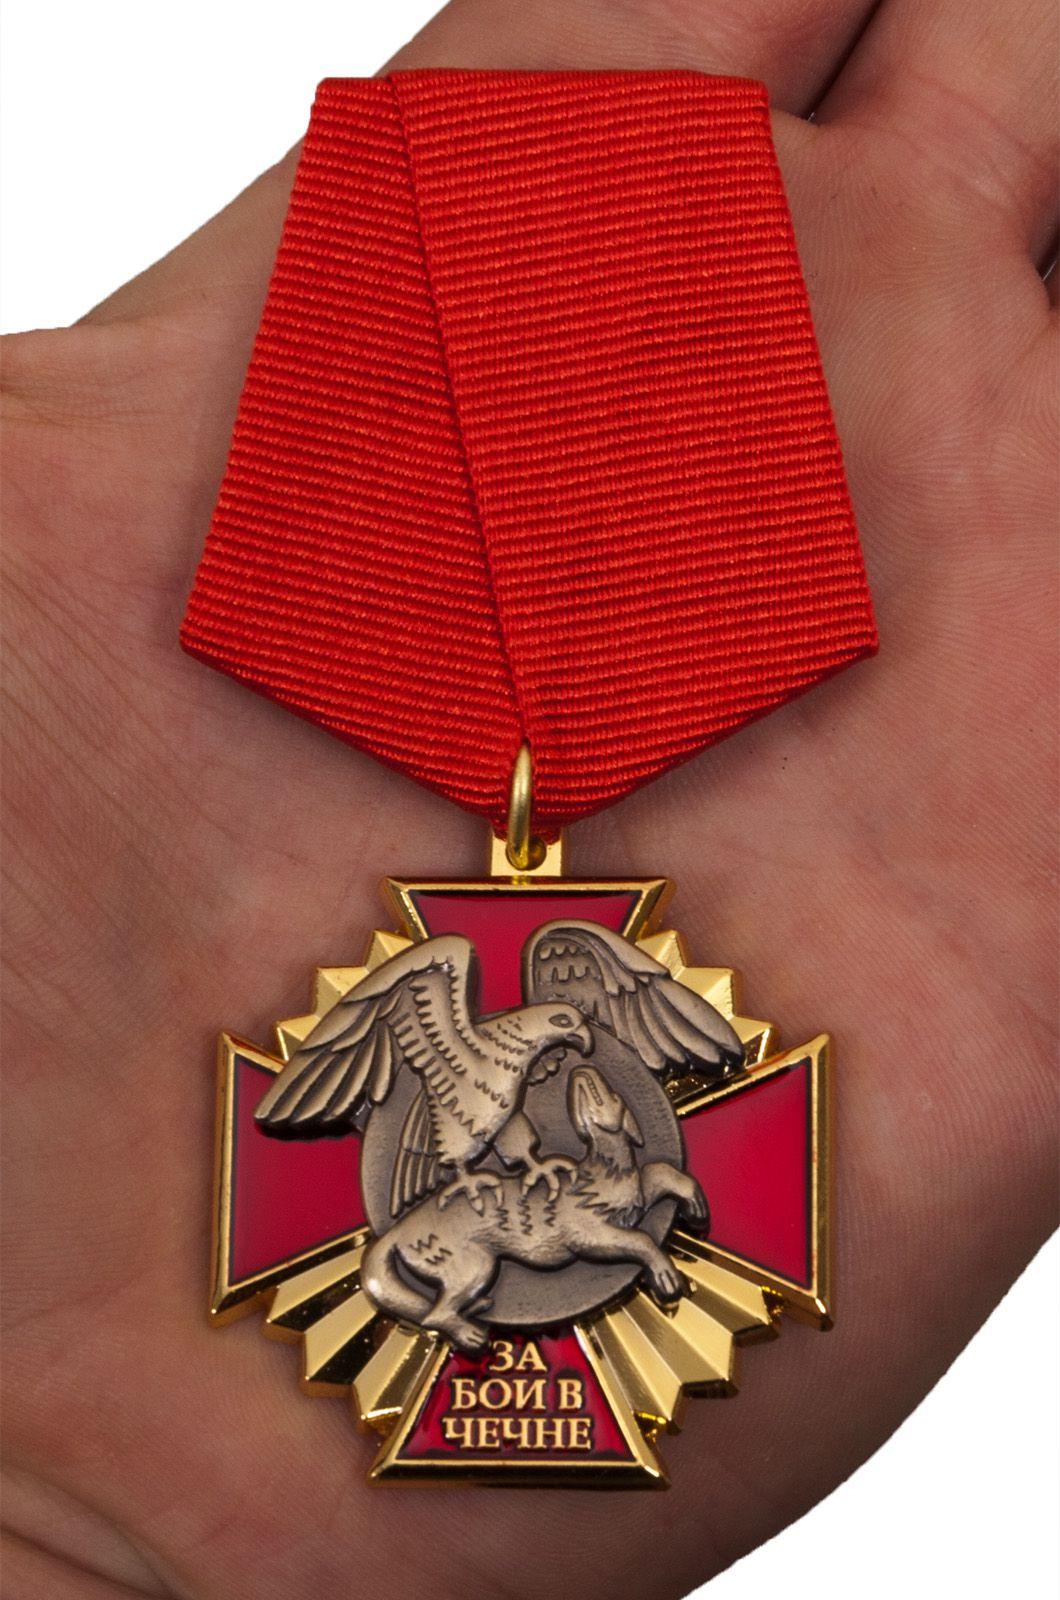 Медаль «За бои в Чечне» - вид на ладони